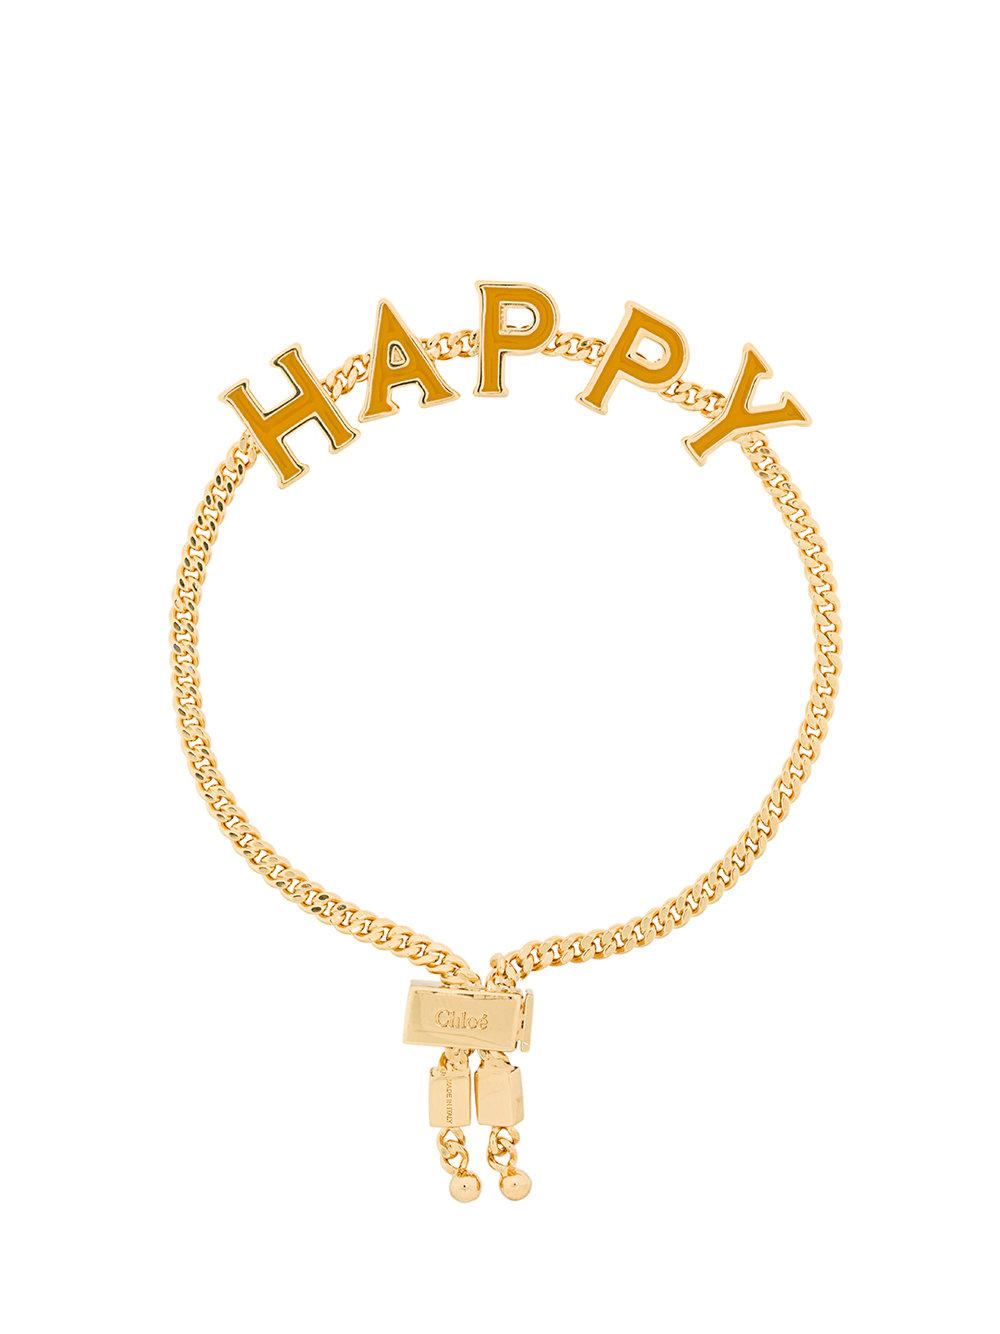 ChloÉ Messages Happy Bracelet In Metallic